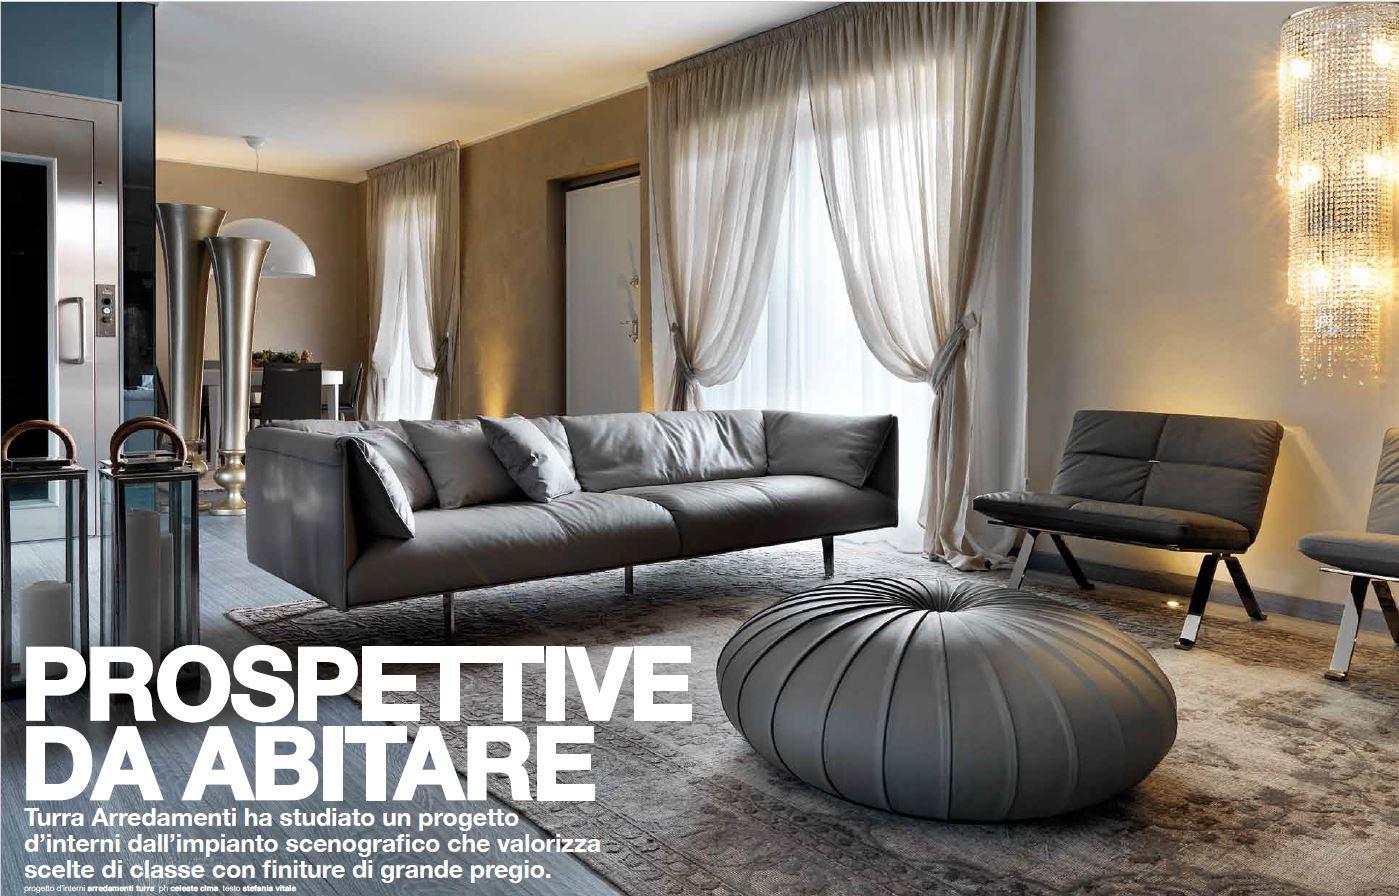 Coerenza materica ed abitativa interior designer turra for Turra arredamenti